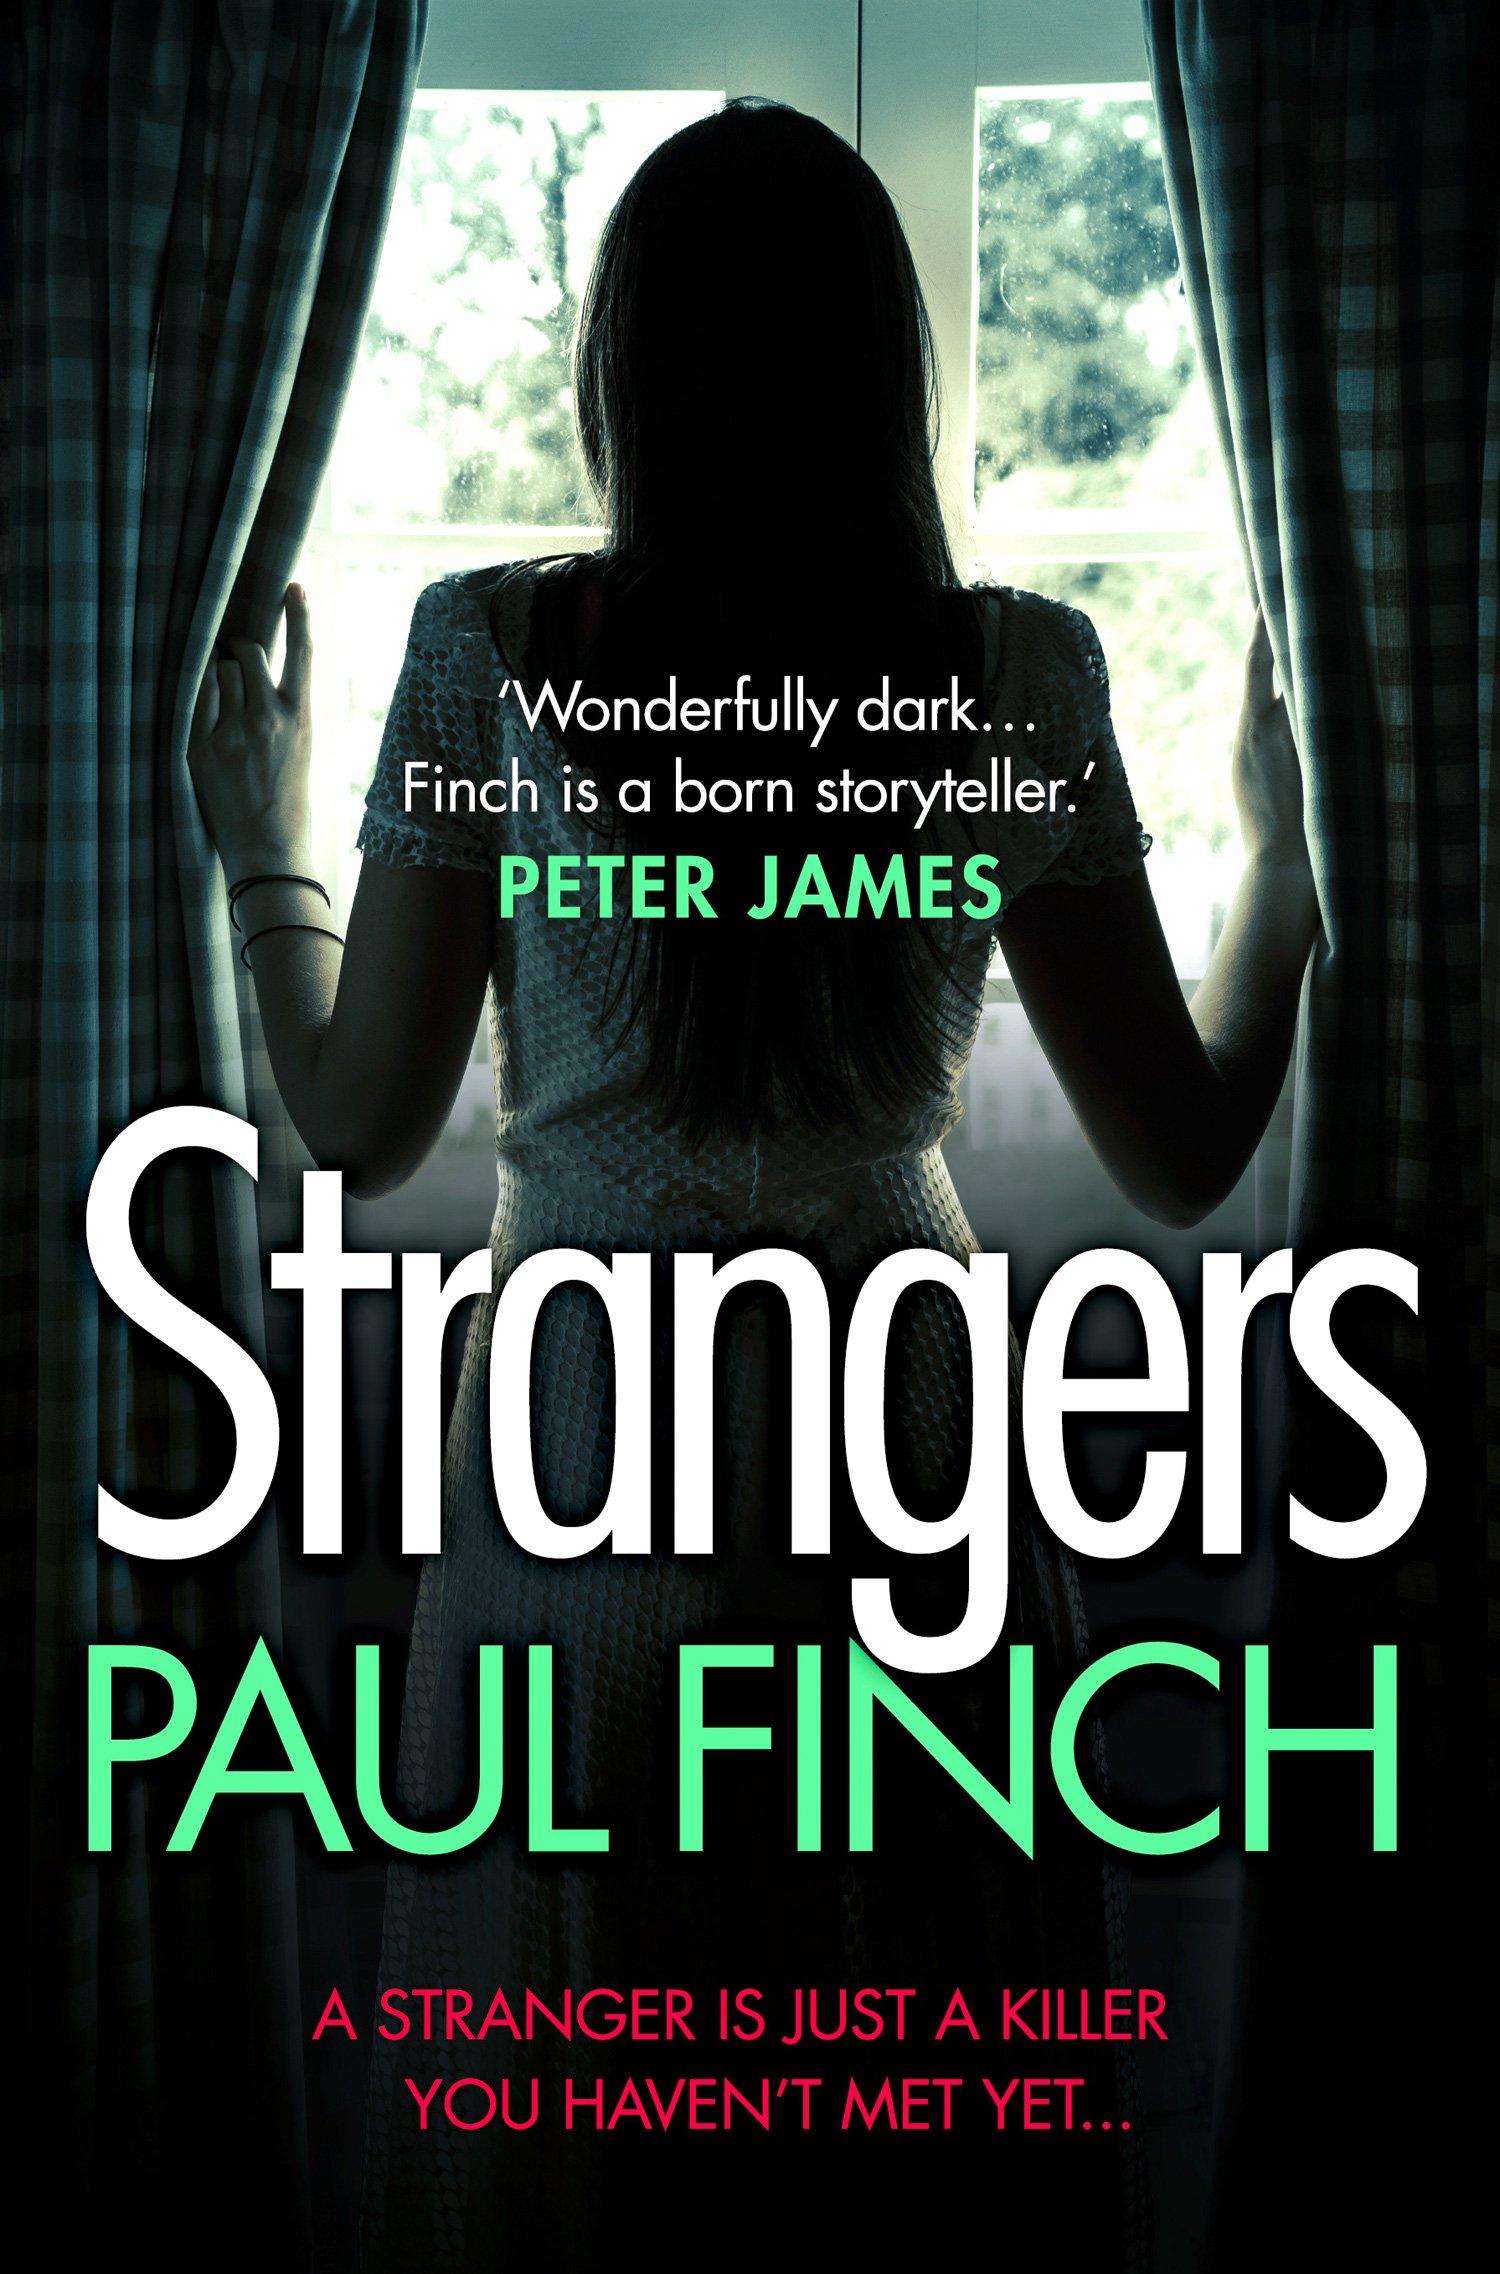 Strangers unforgettable crime thriller bestseller product image